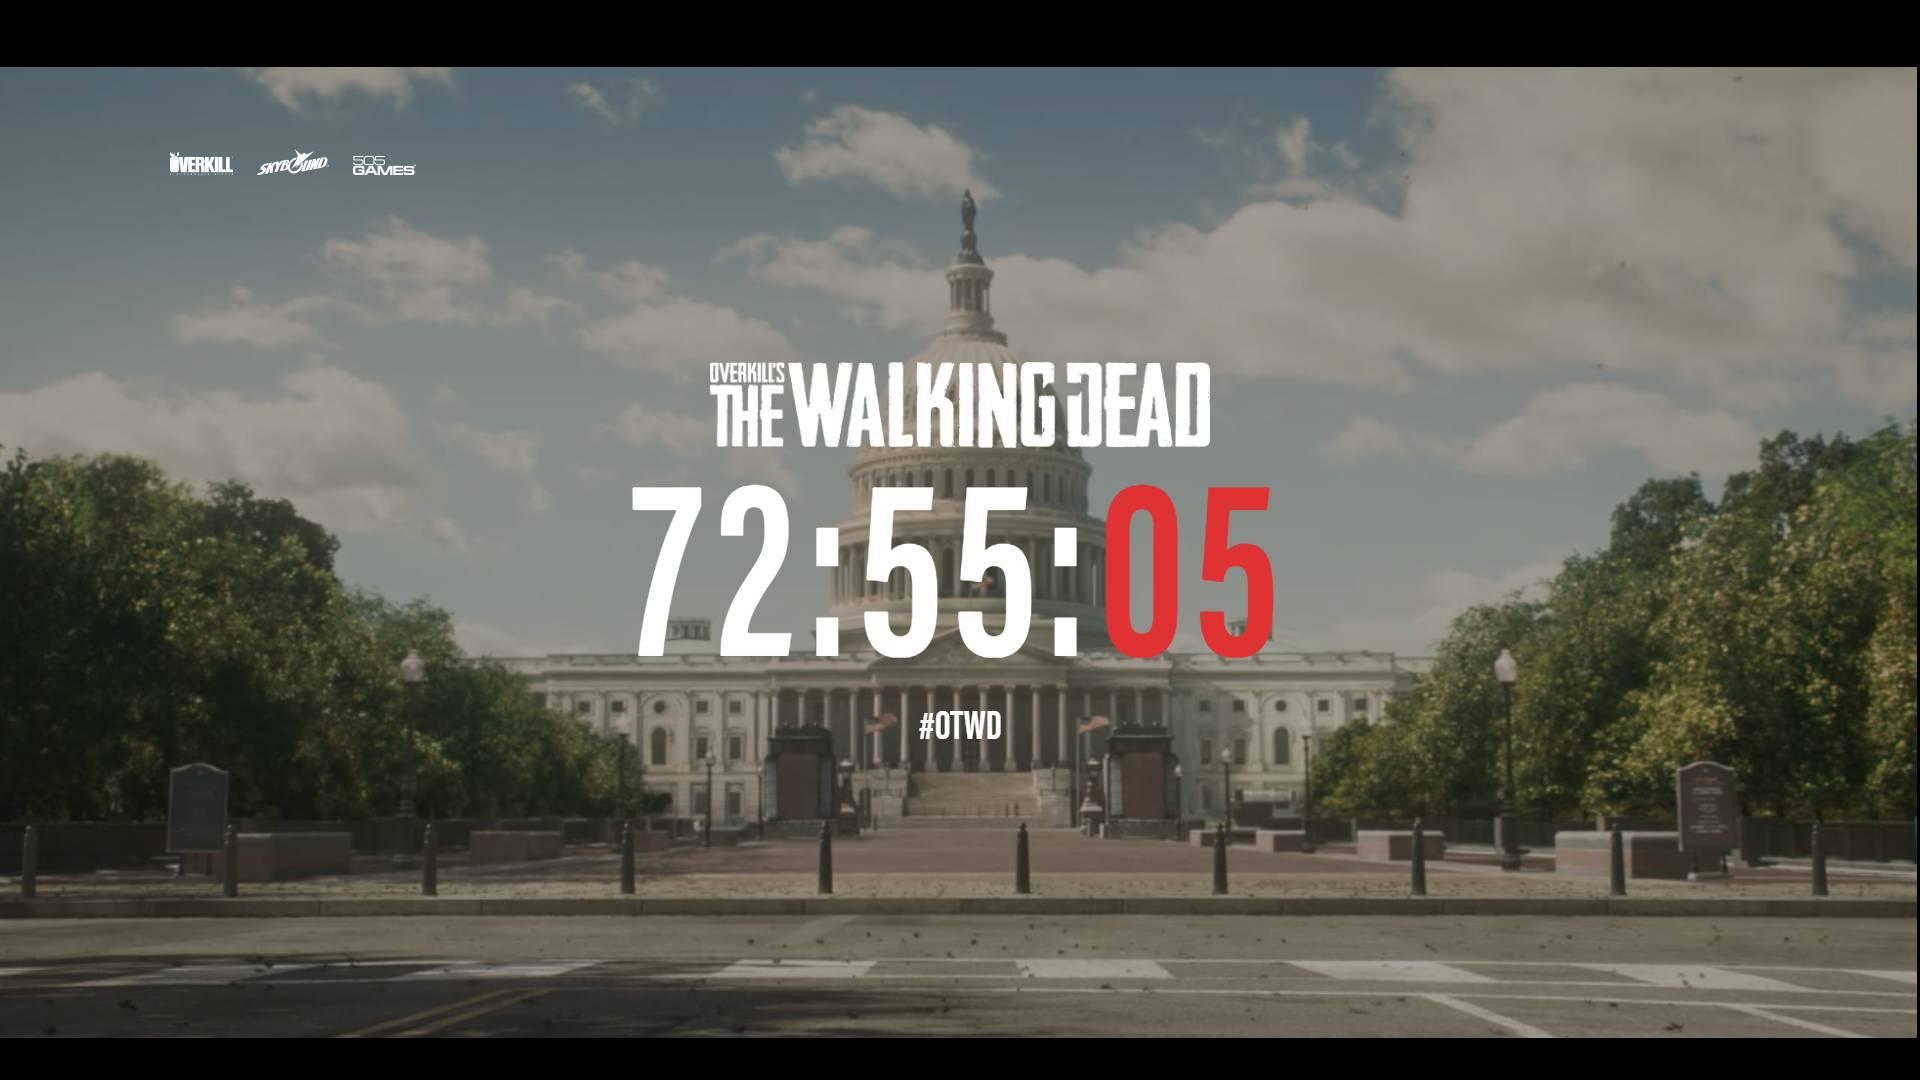 Overkill's The Walking Dead A